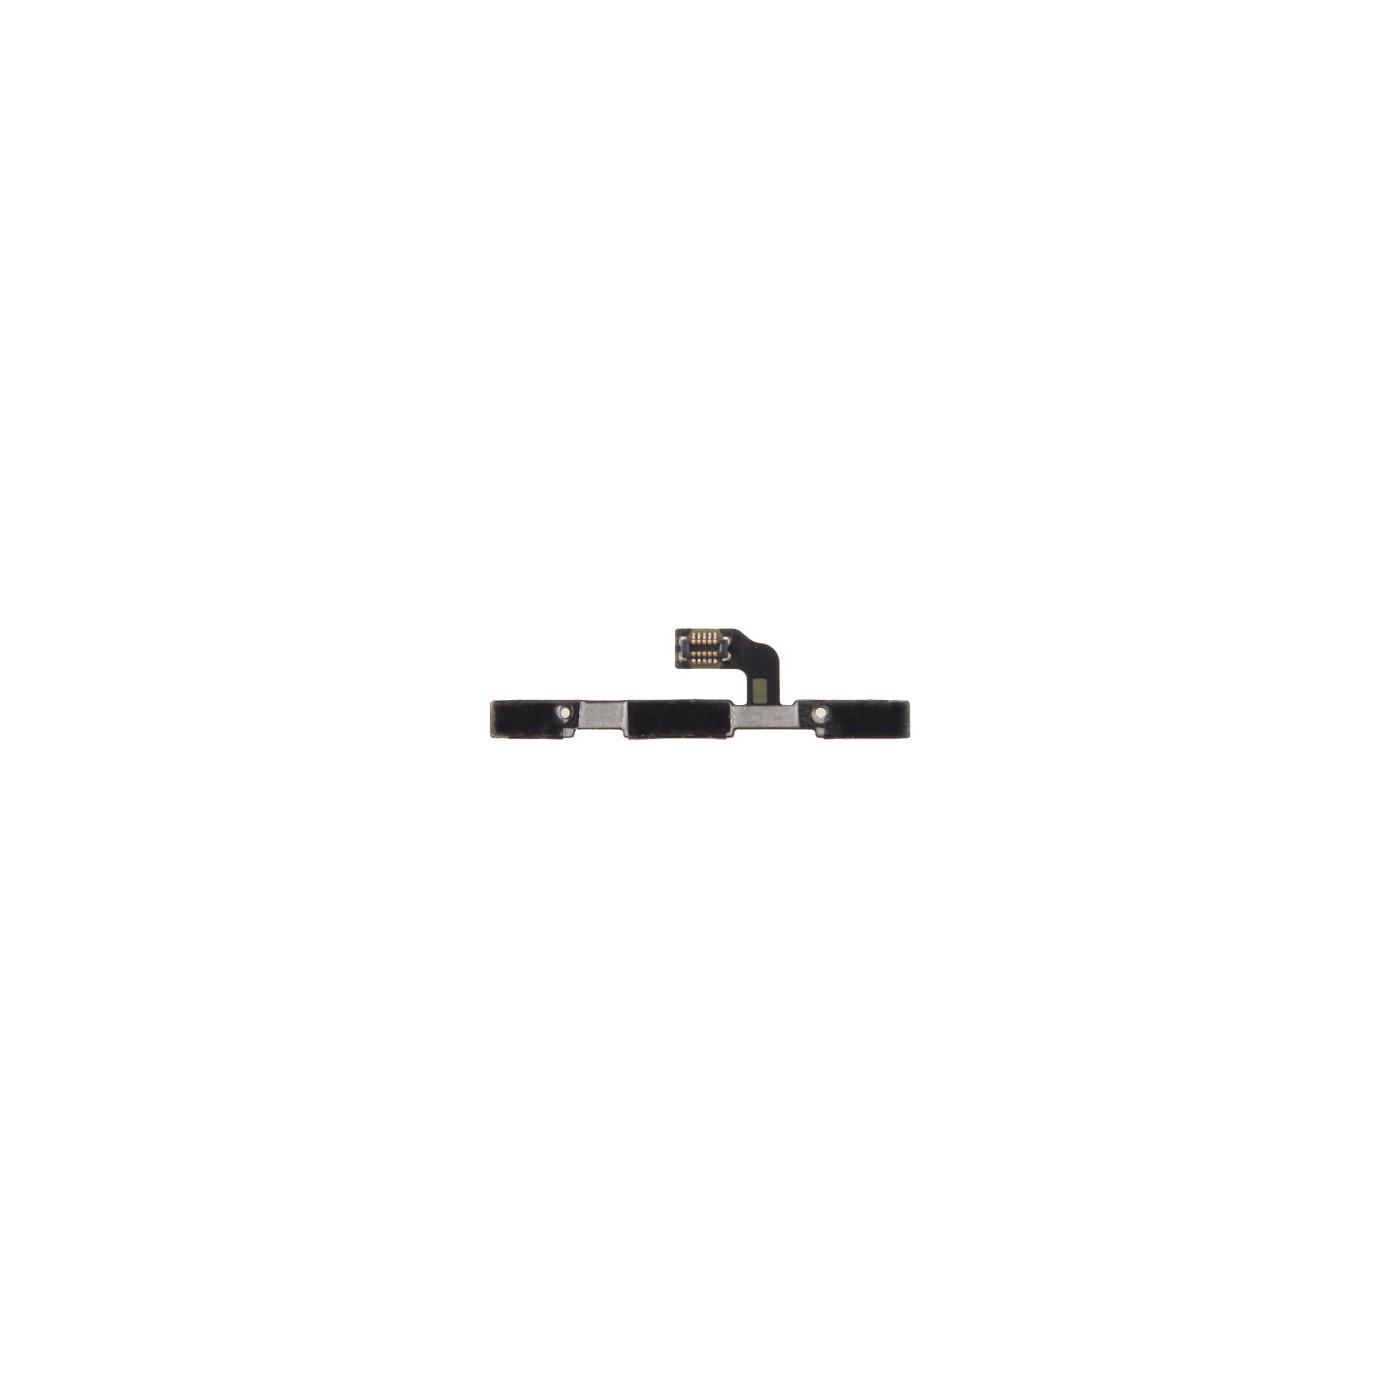 Botón de encendido para flex plana Huawei P8